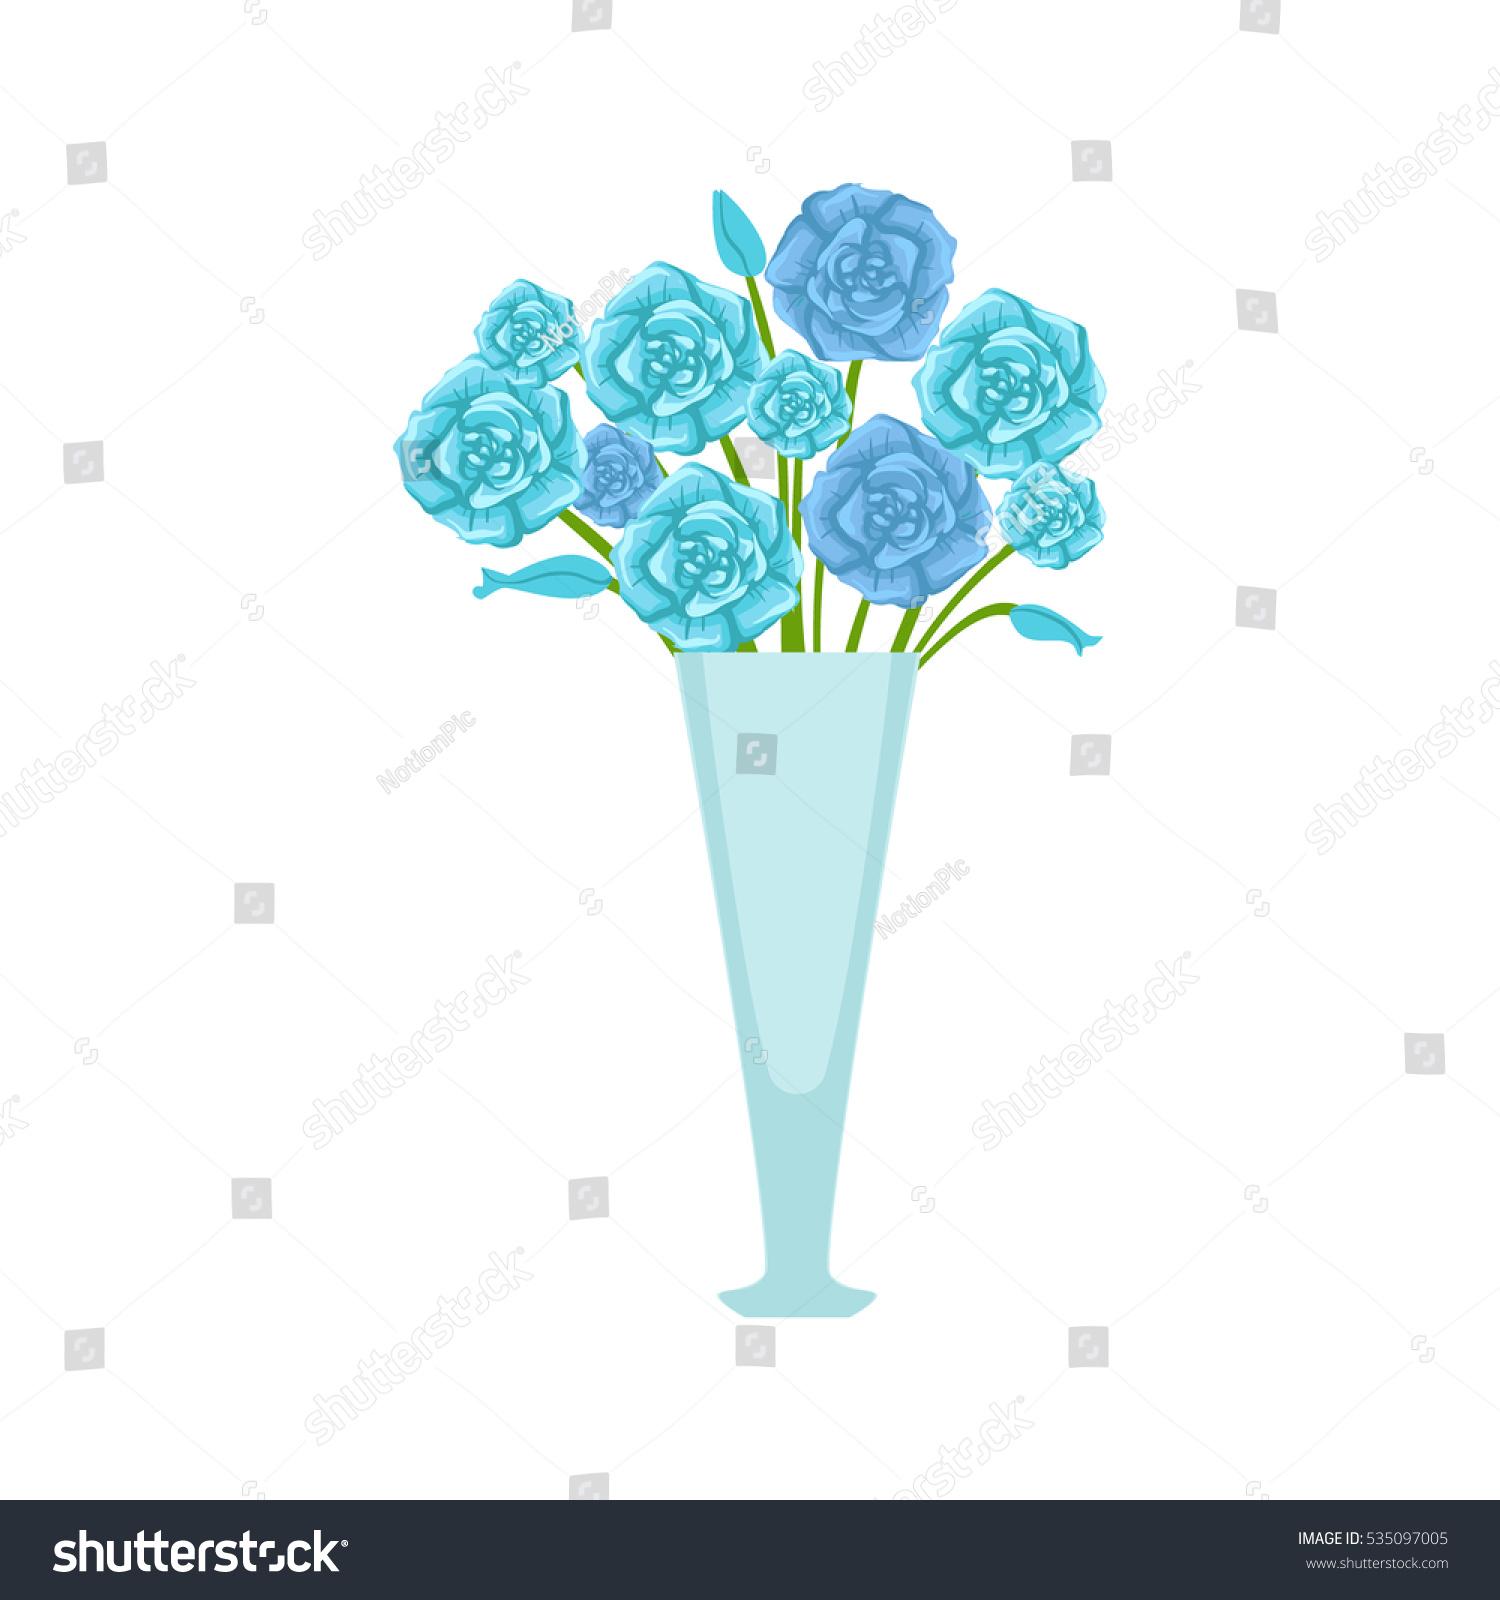 Blue Roses Flower Bouquet Tall Flower Stock Vector 535097005 ...